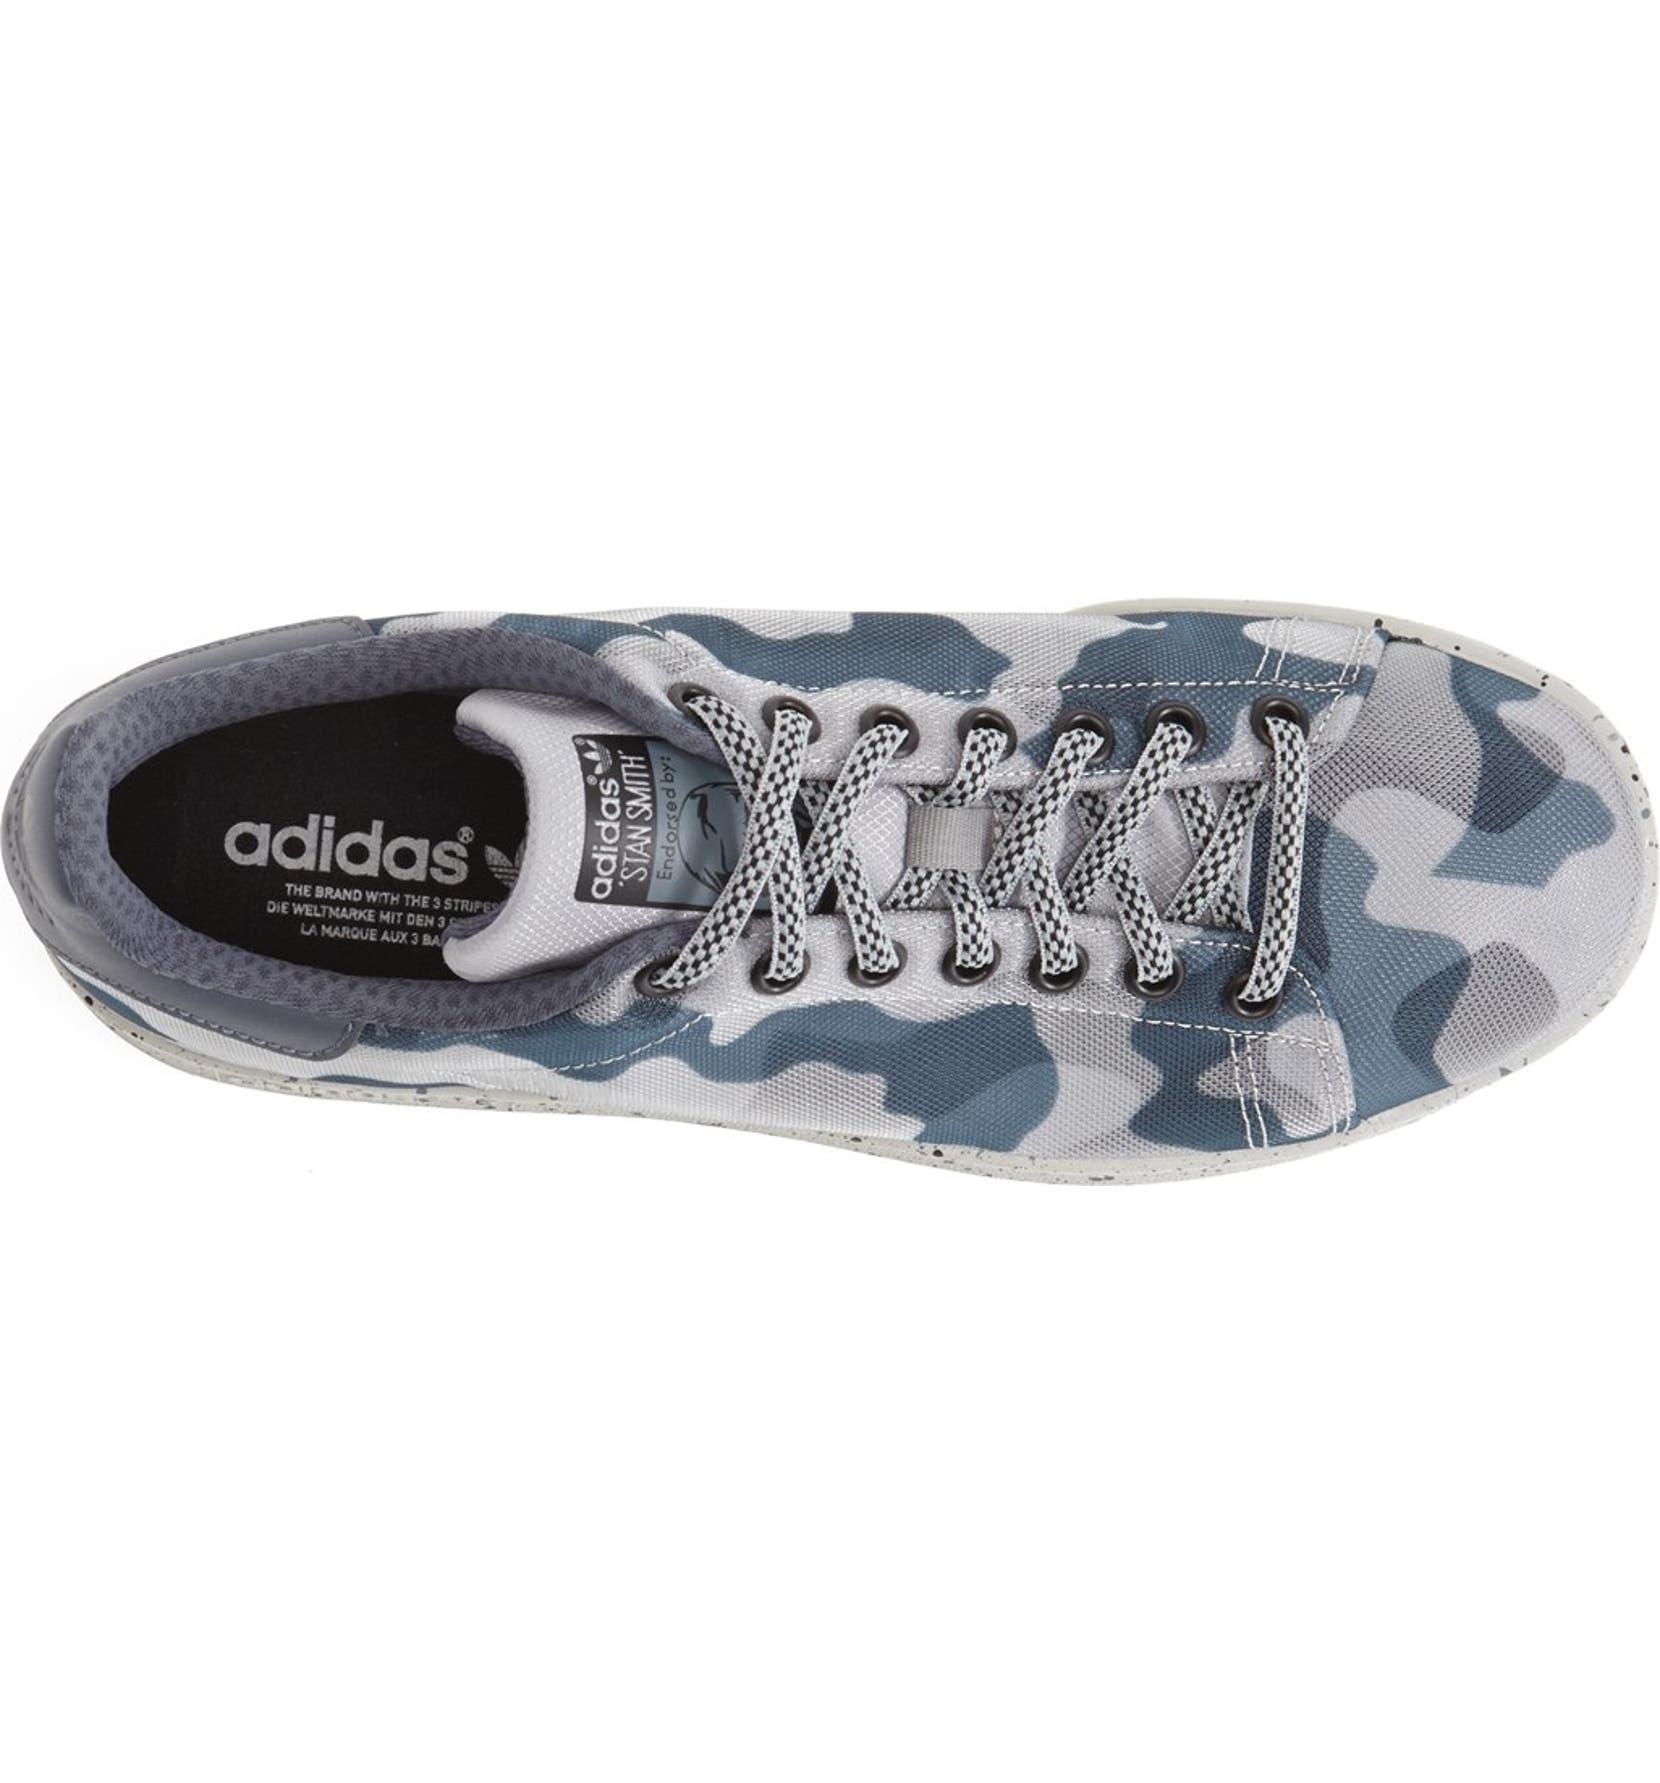 huge selection of 08882 8b367 adidas Stan Smith Camo Sneaker (Men)  Nordstrom